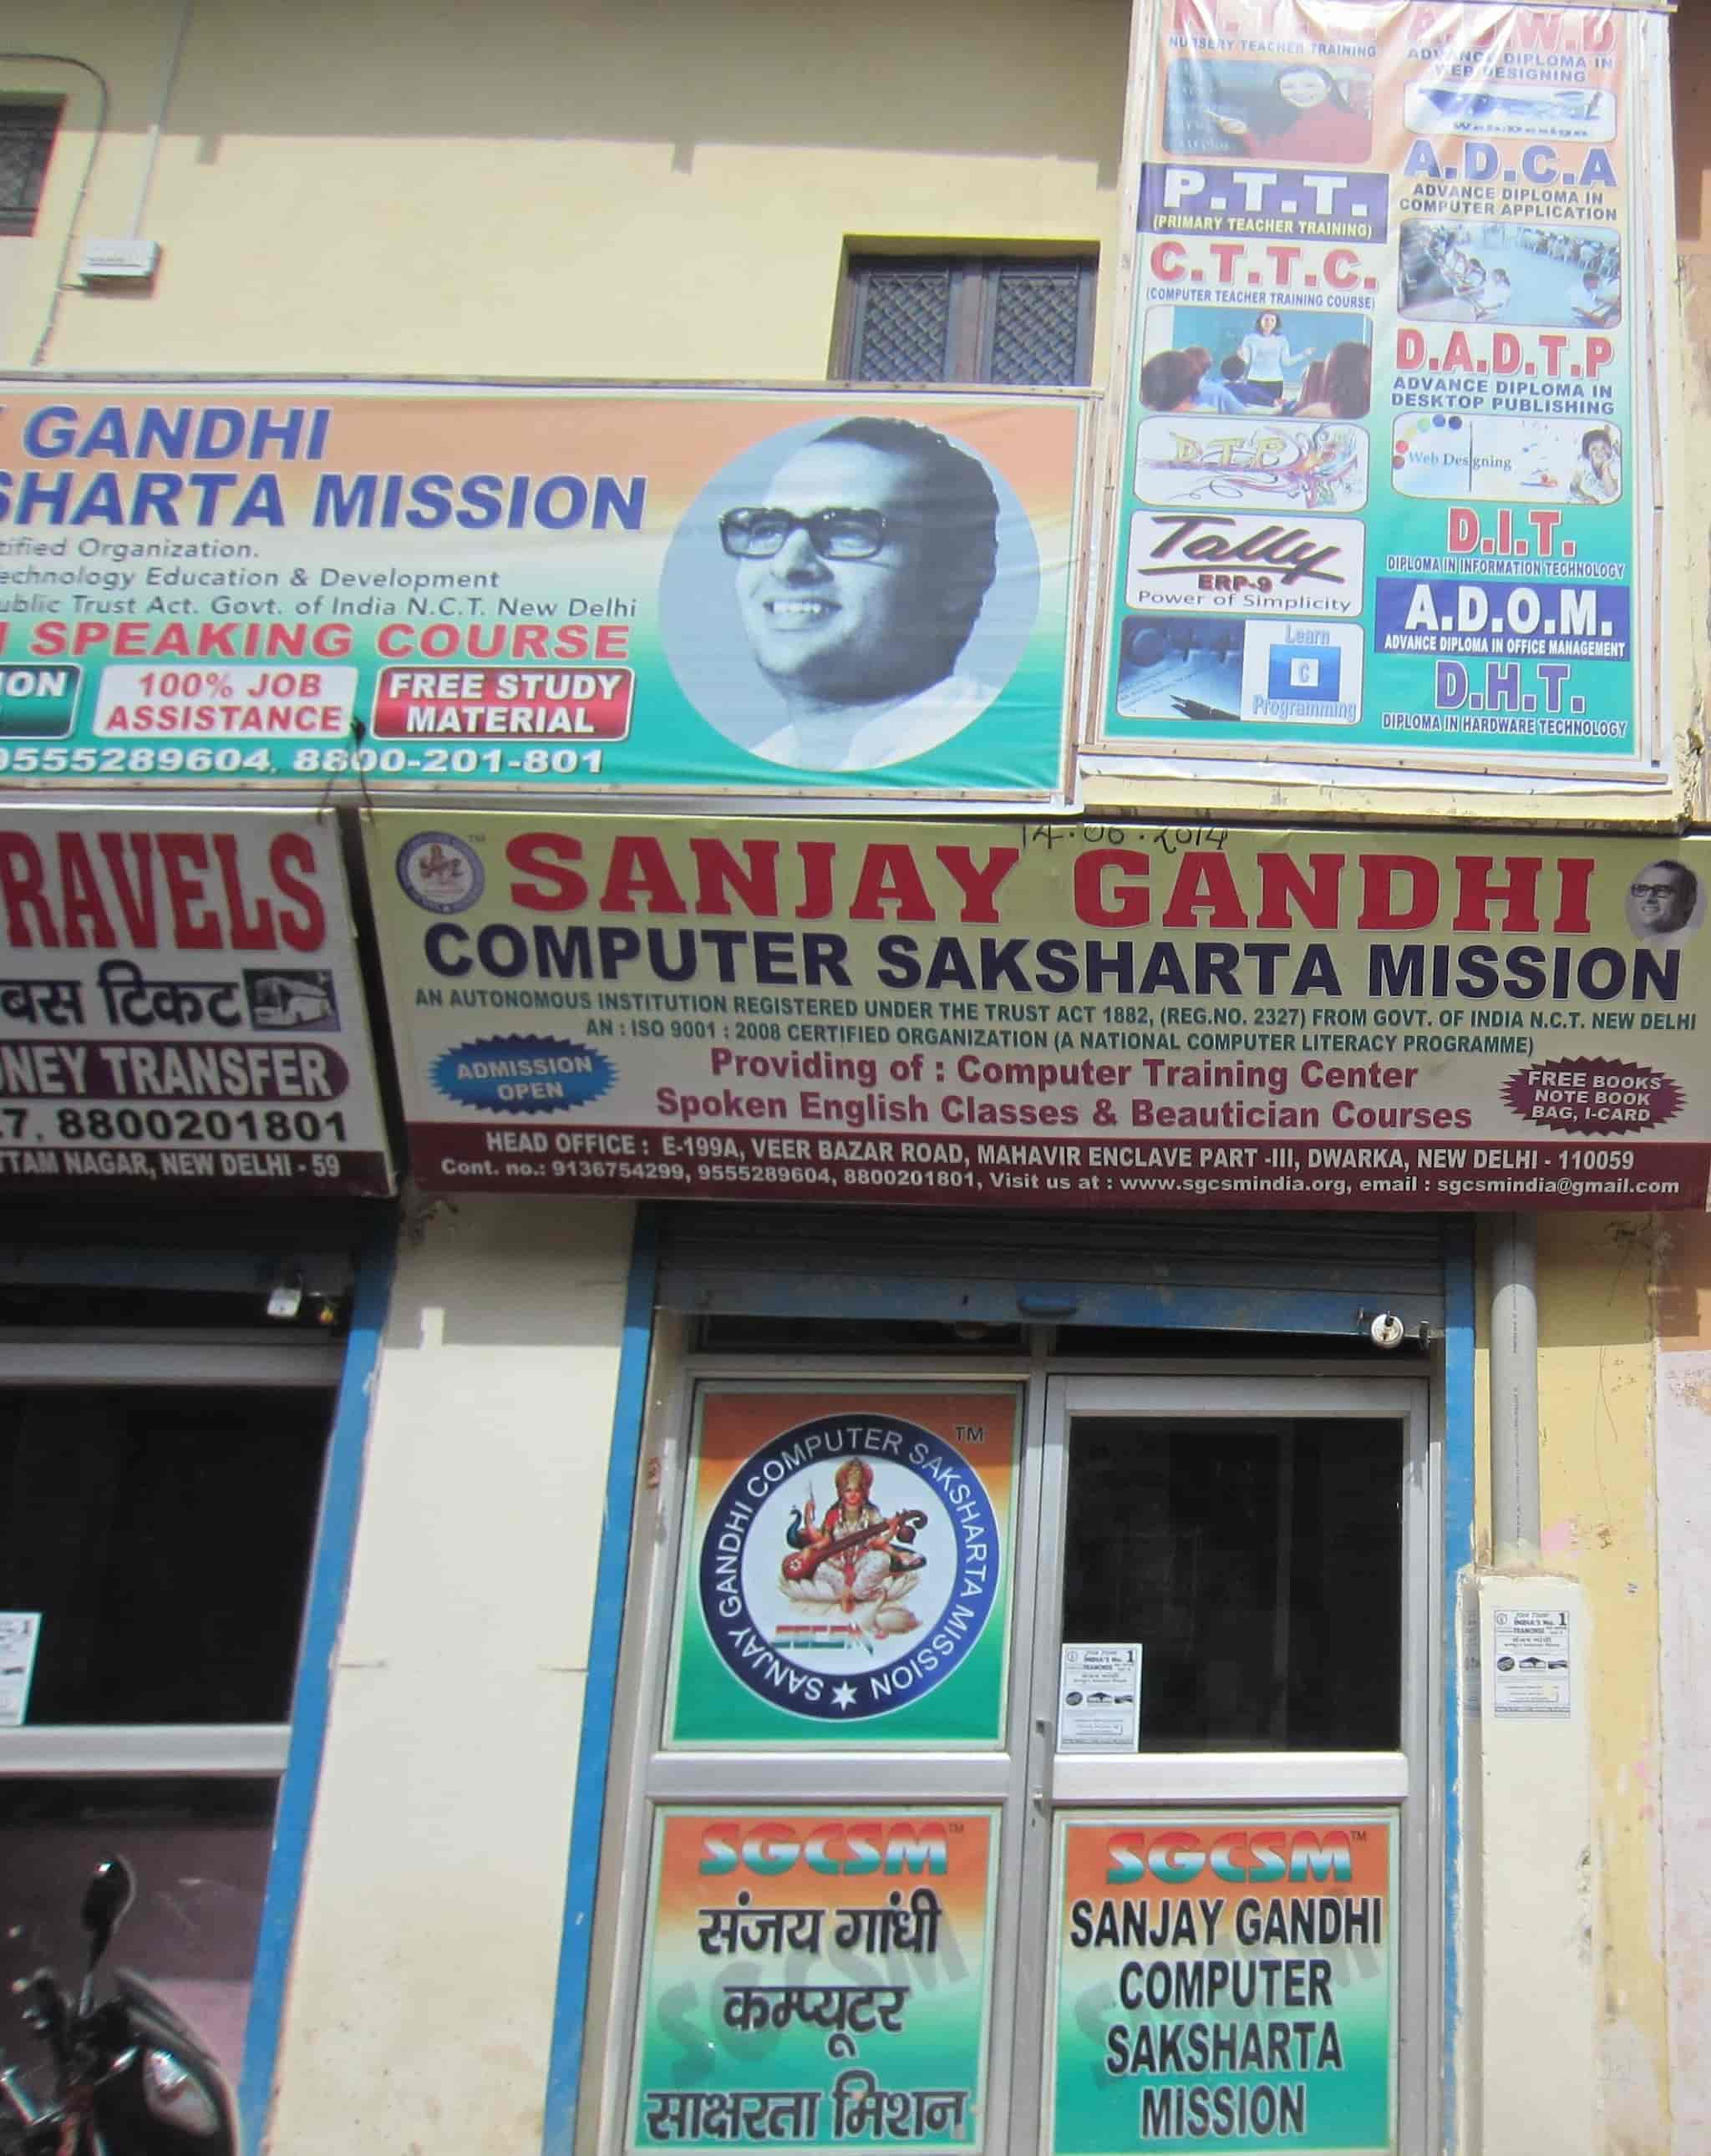 Sanjay Gandhi Computer Saksharta Mission Photos, , Delhi